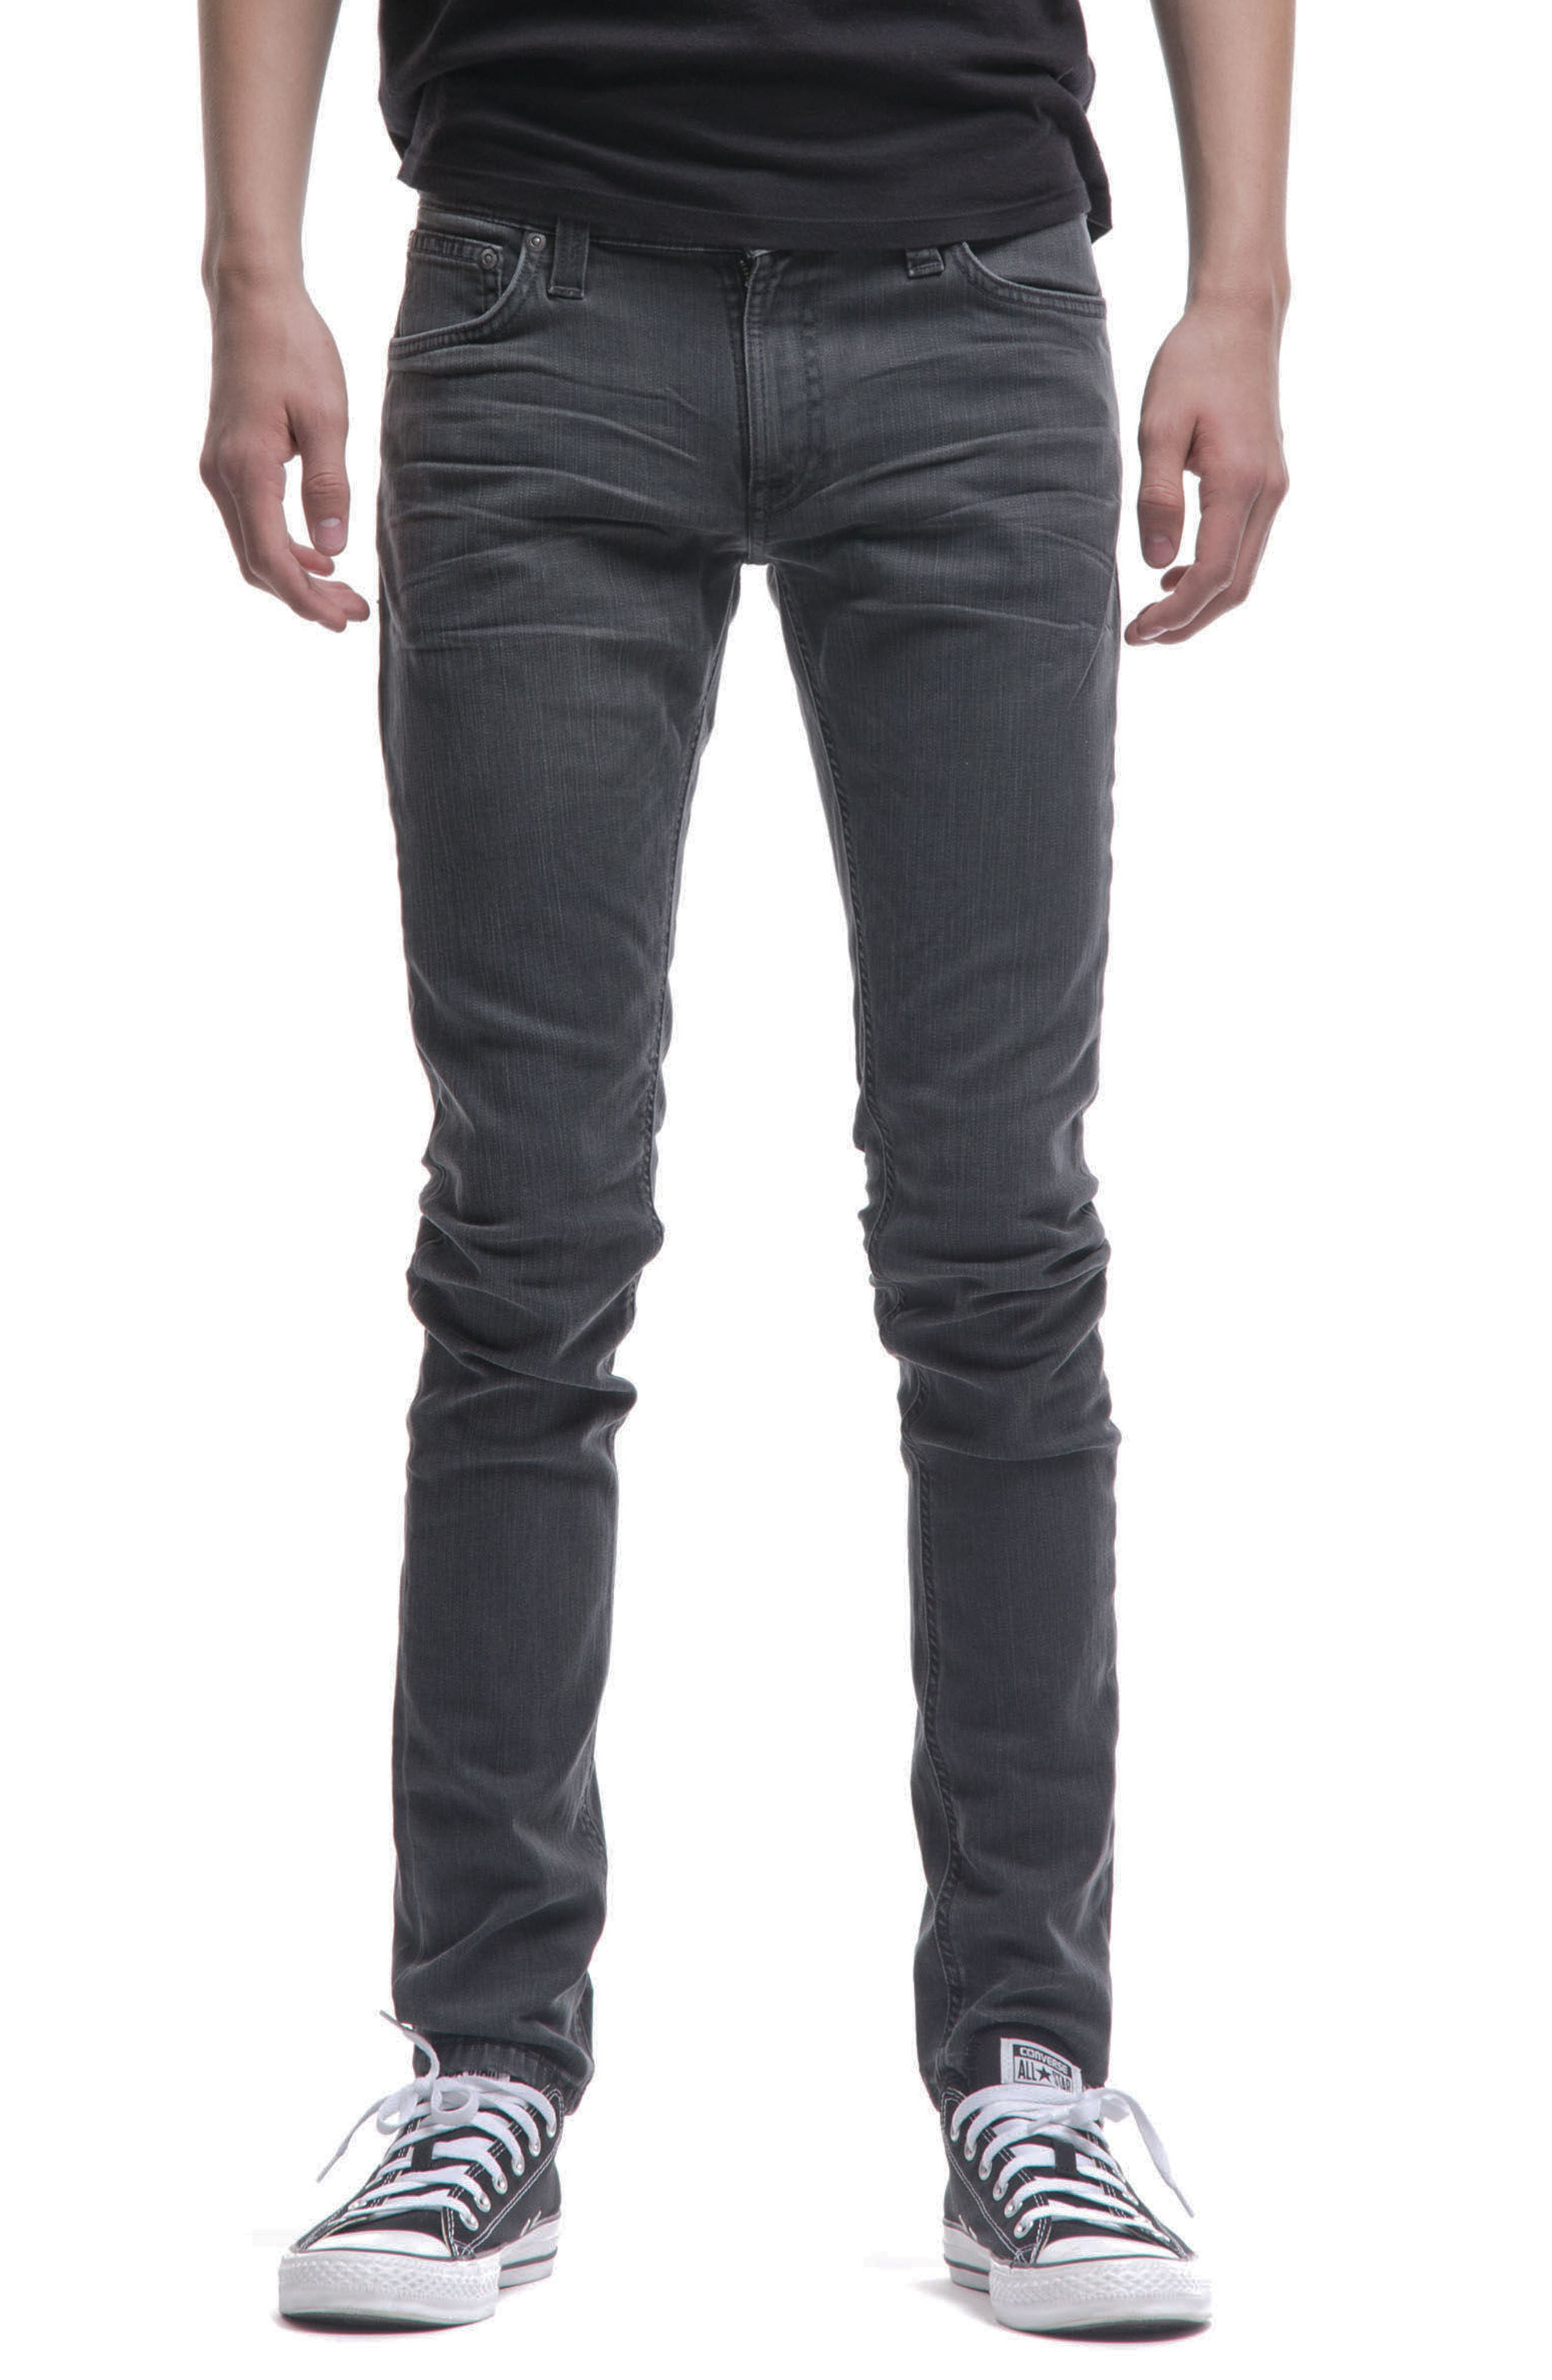 Skinny Lin Skinny Fit Jeans,                             Main thumbnail 1, color,